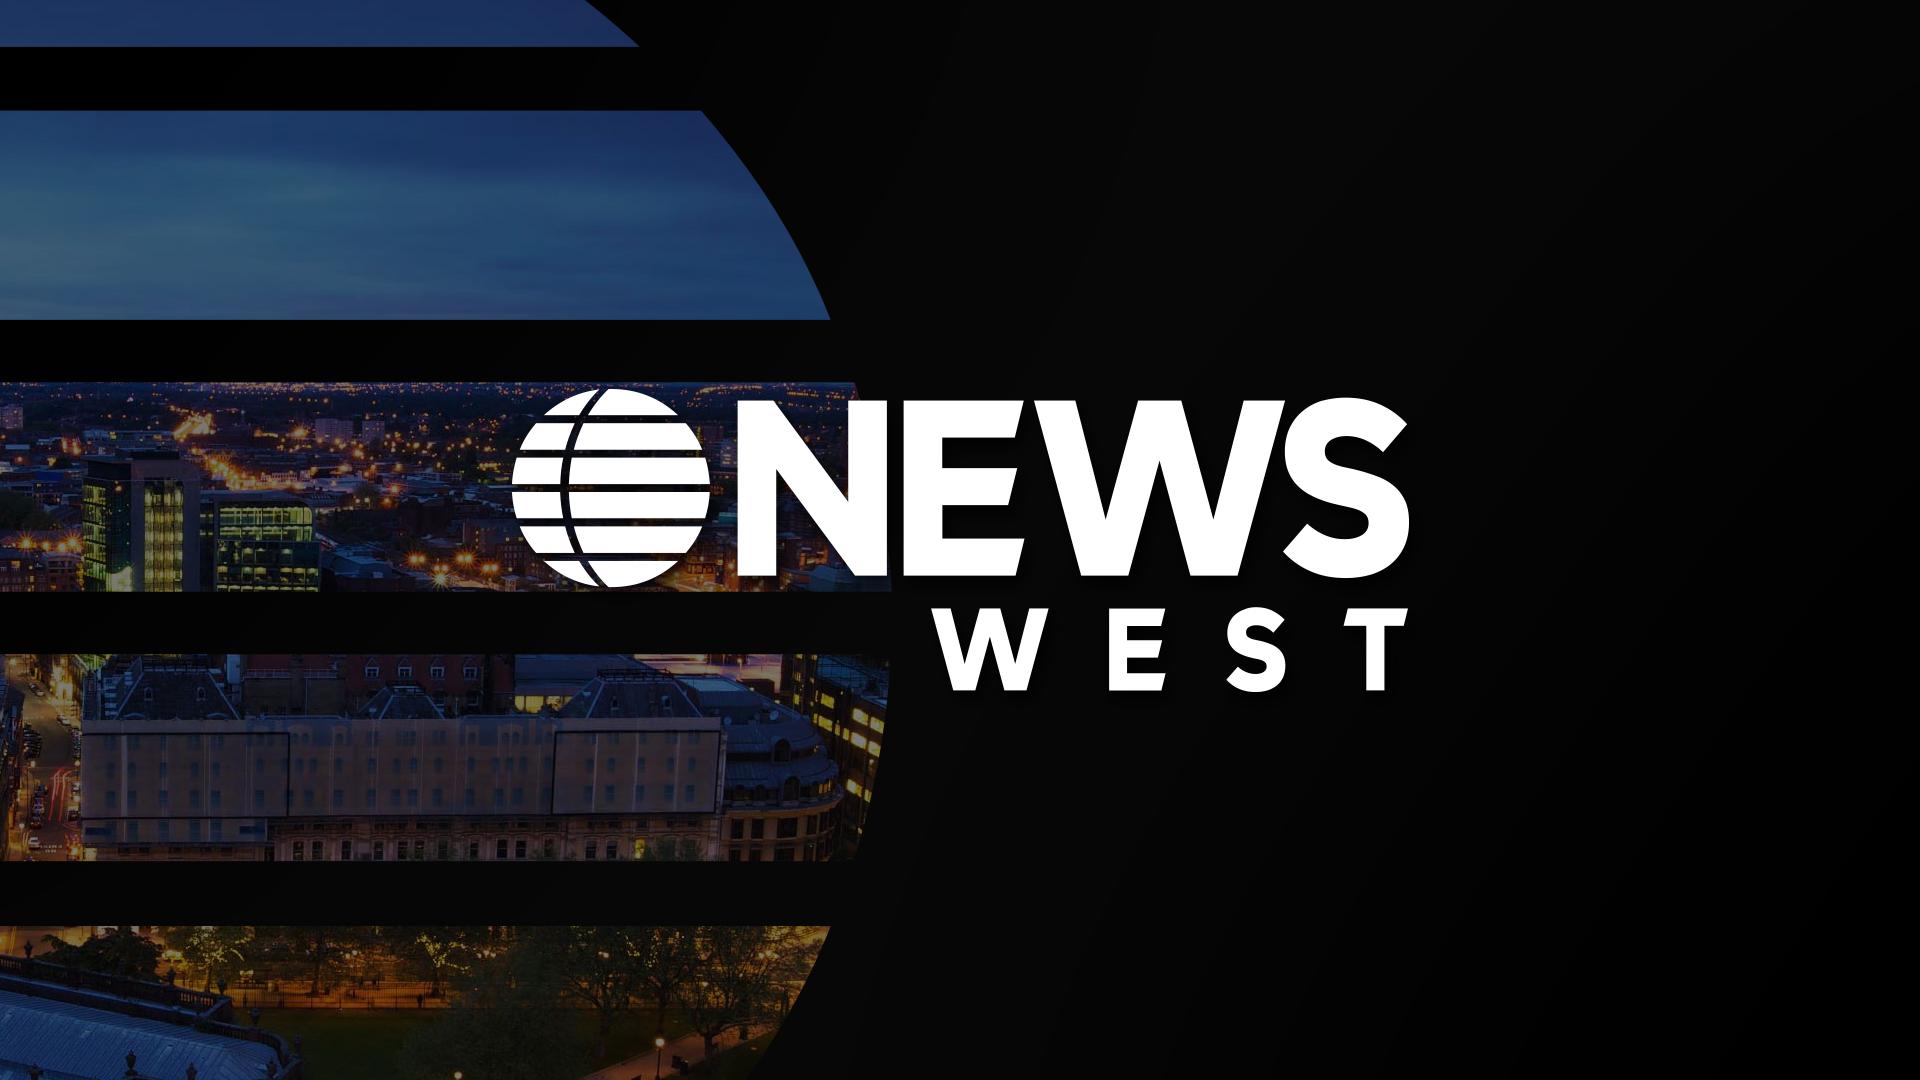 Centric News West